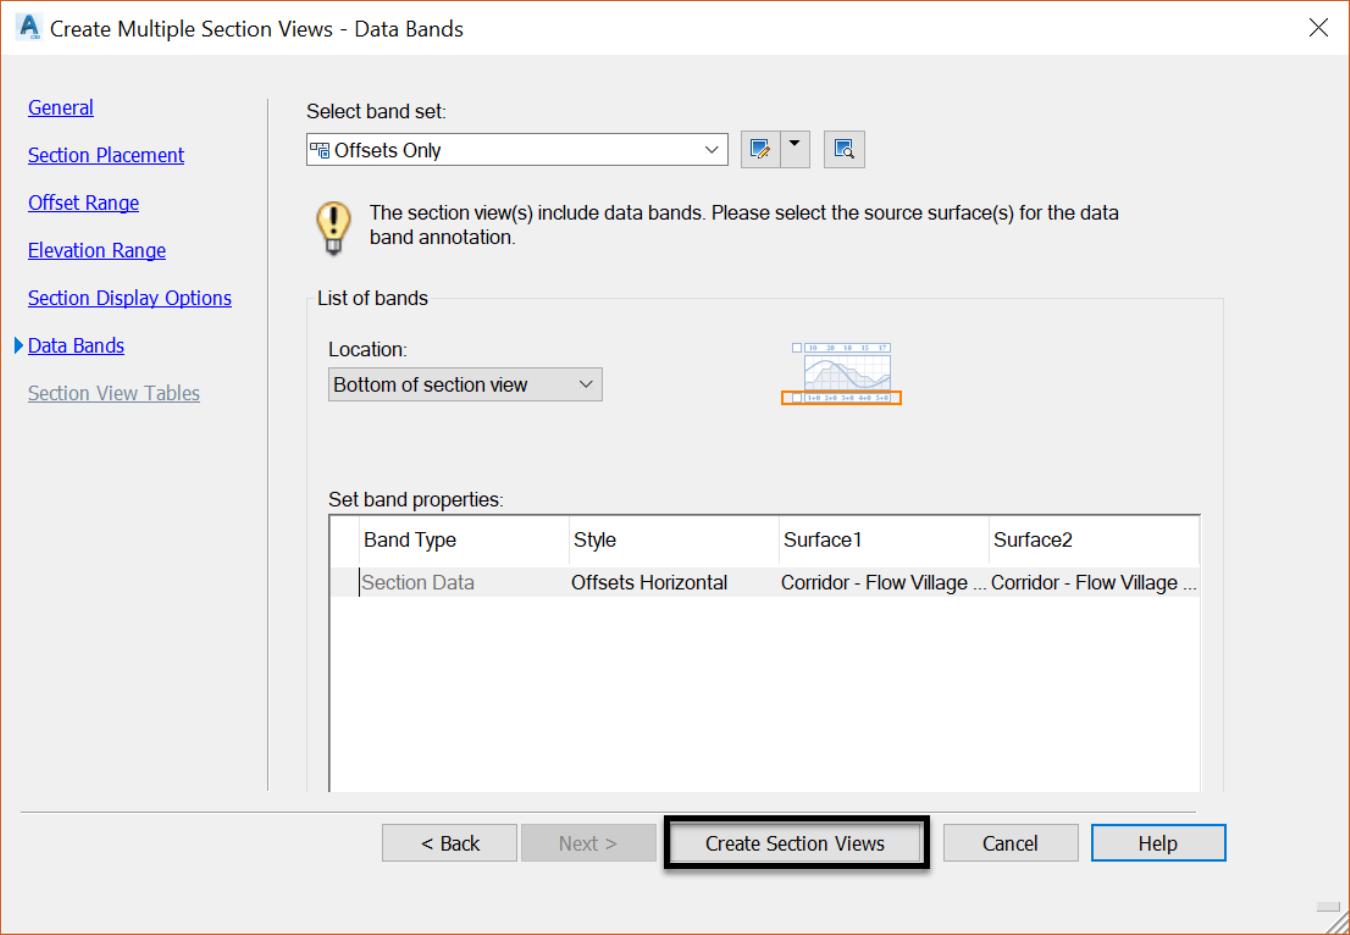 C:\Users\Infratech.Civil\AppData\Local\Microsoft\Windows\INetCache\Content.MSO\8C4A2331.tmp